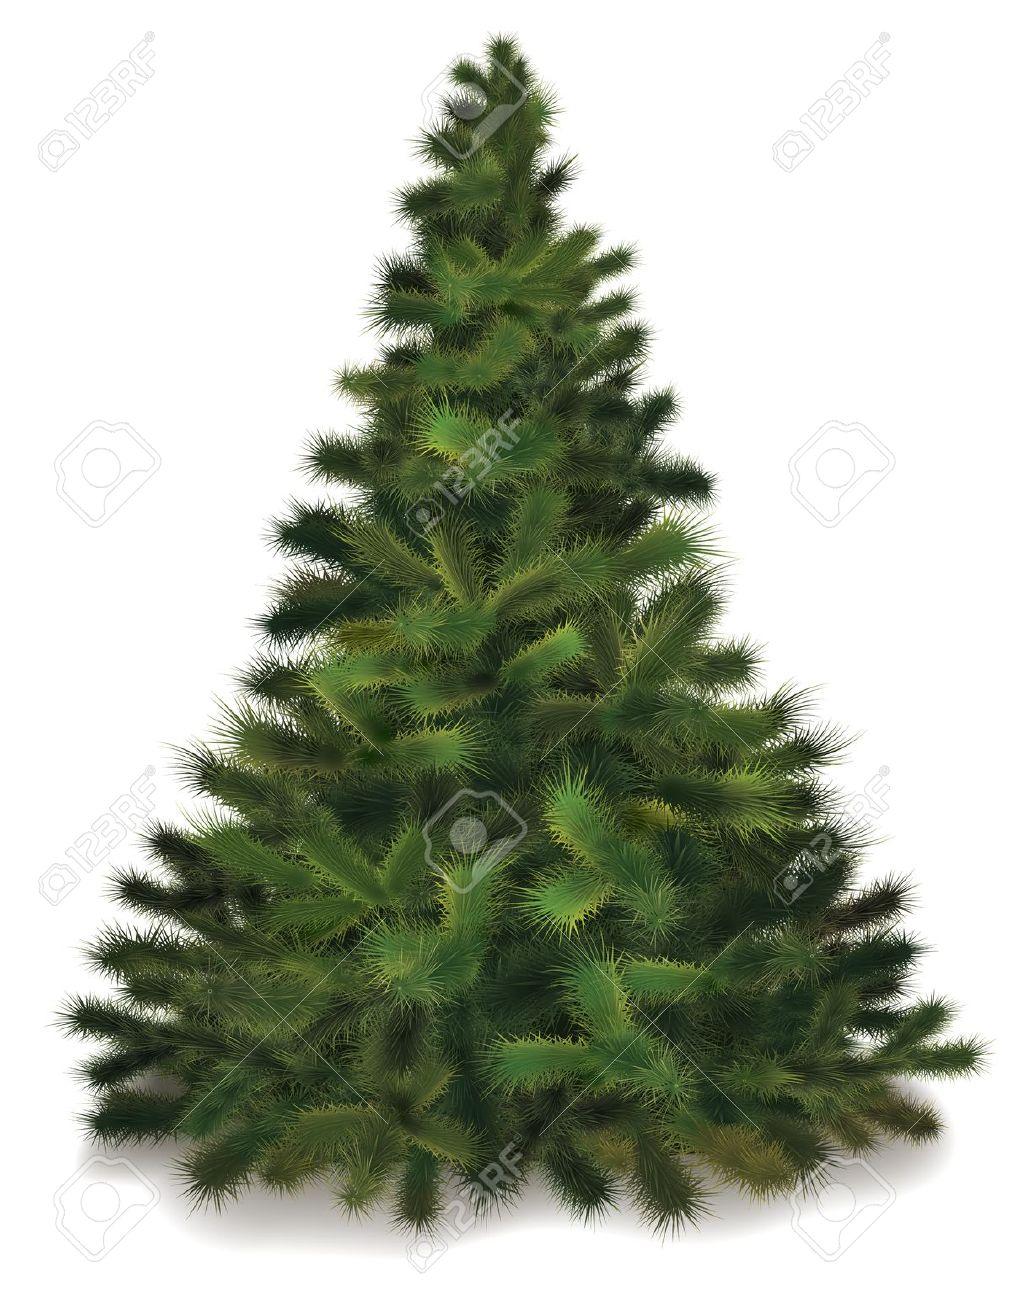 11341334-Christmas-tree- .-11341334-Christmas-tree- .-15